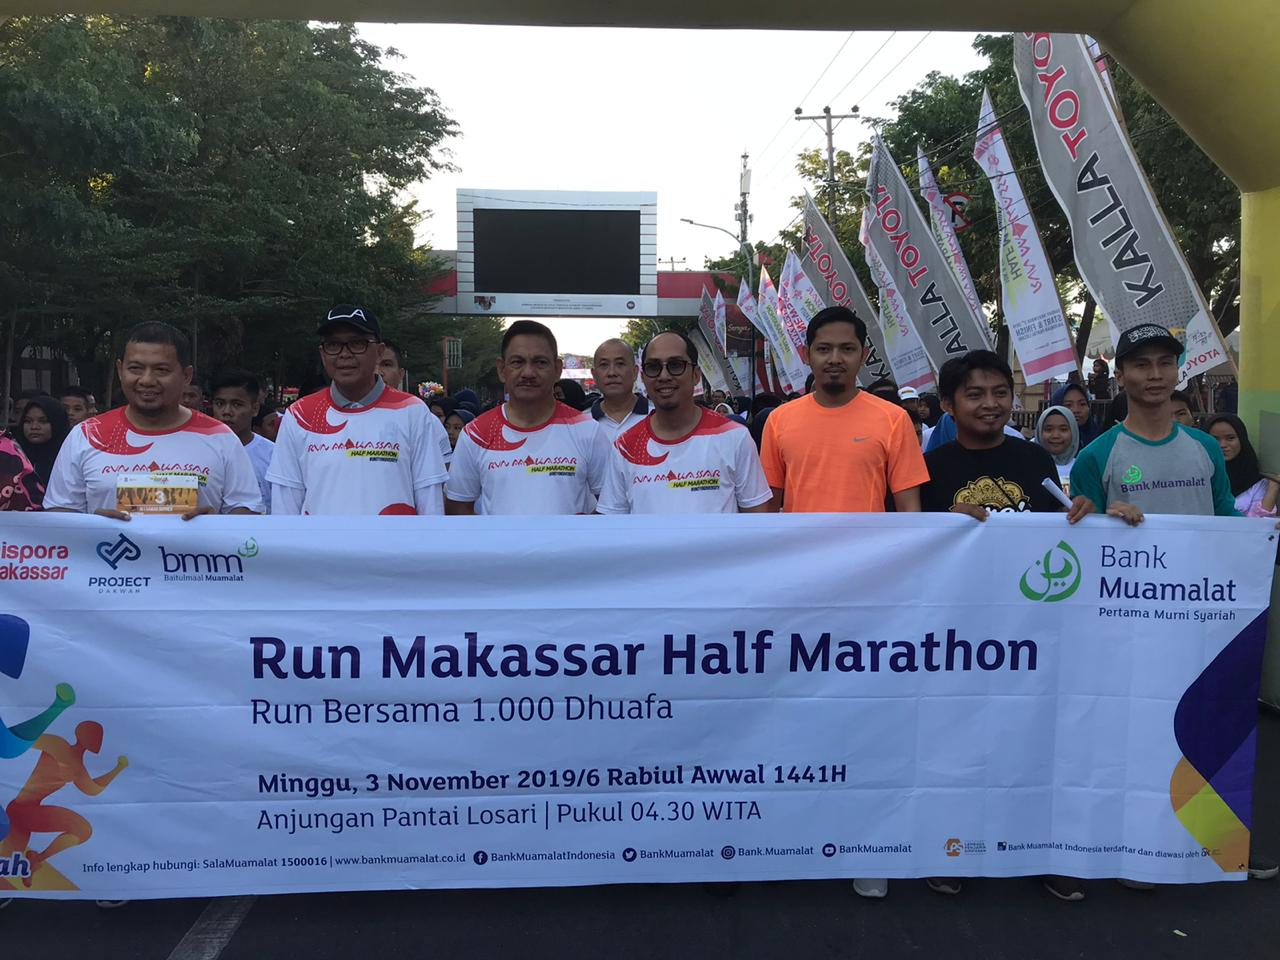 files/news/run-makassar-half-marathon-38beb9fda6.jpeg